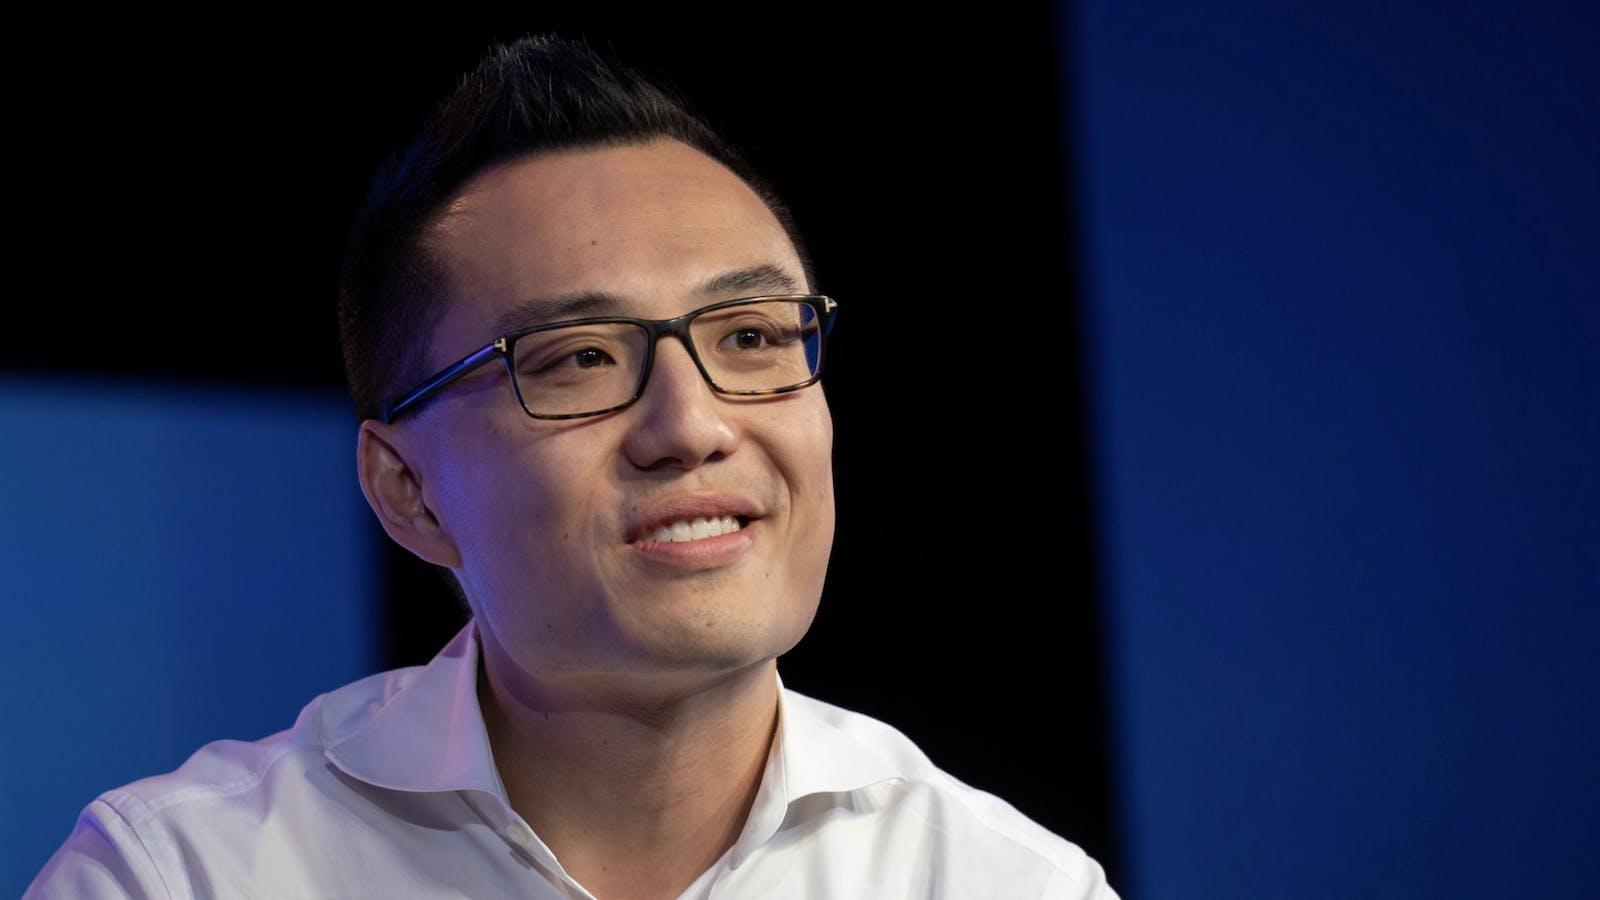 DoorDash CEO Tony Xu